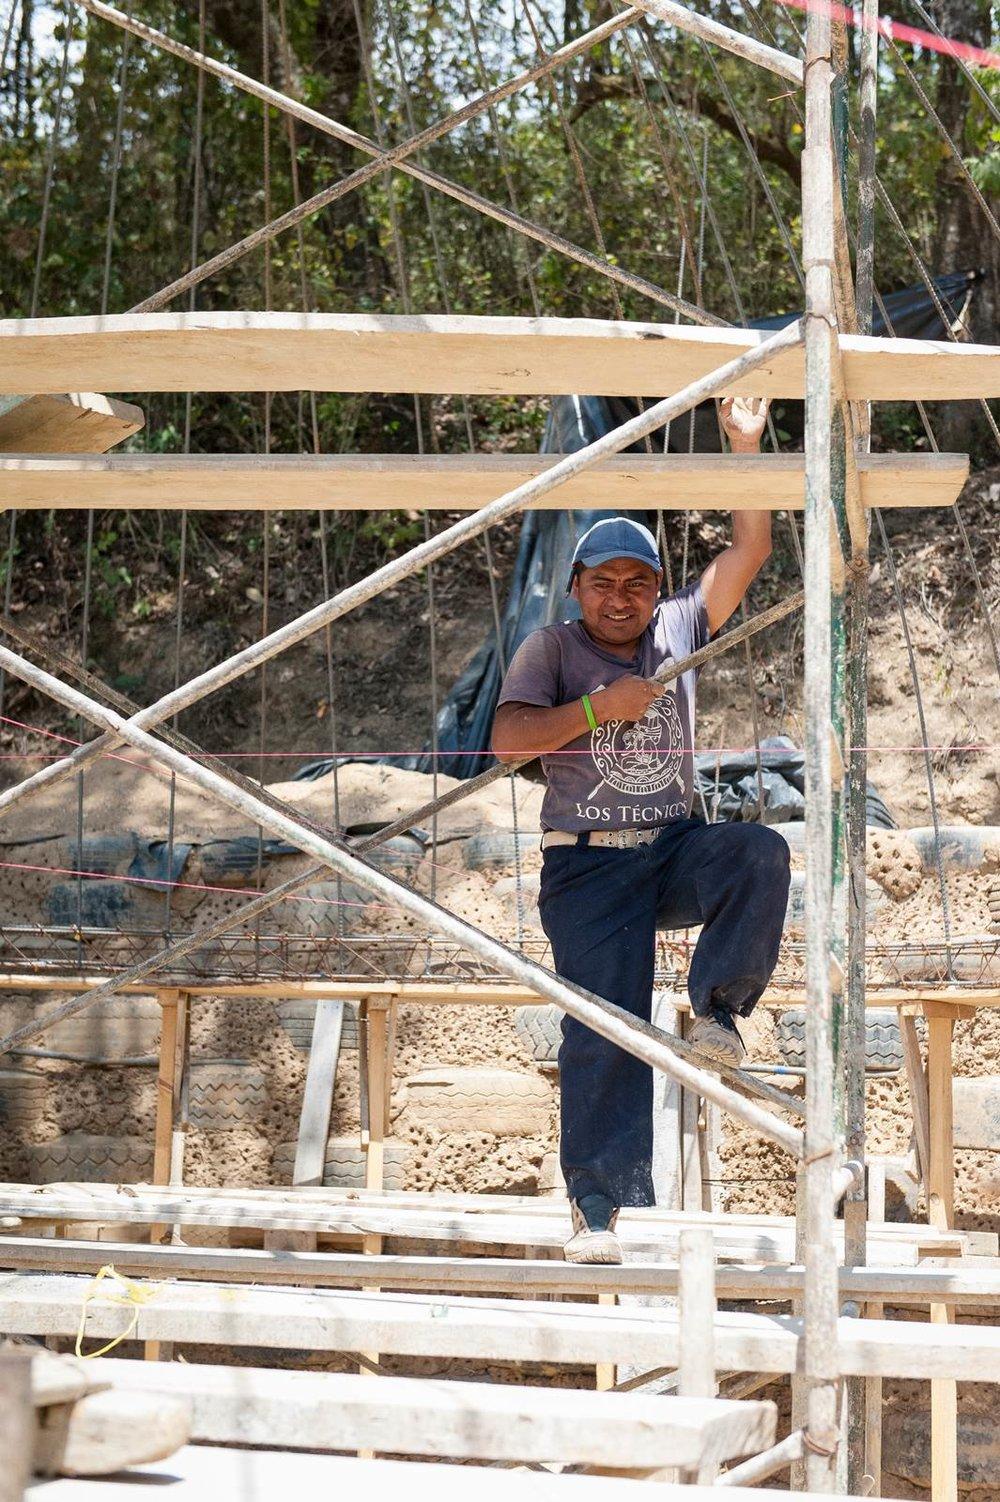 1540 LONG WAY HOME_2016_Guatemala_photographers without borders_ronbwilson_160307_1705.jpg